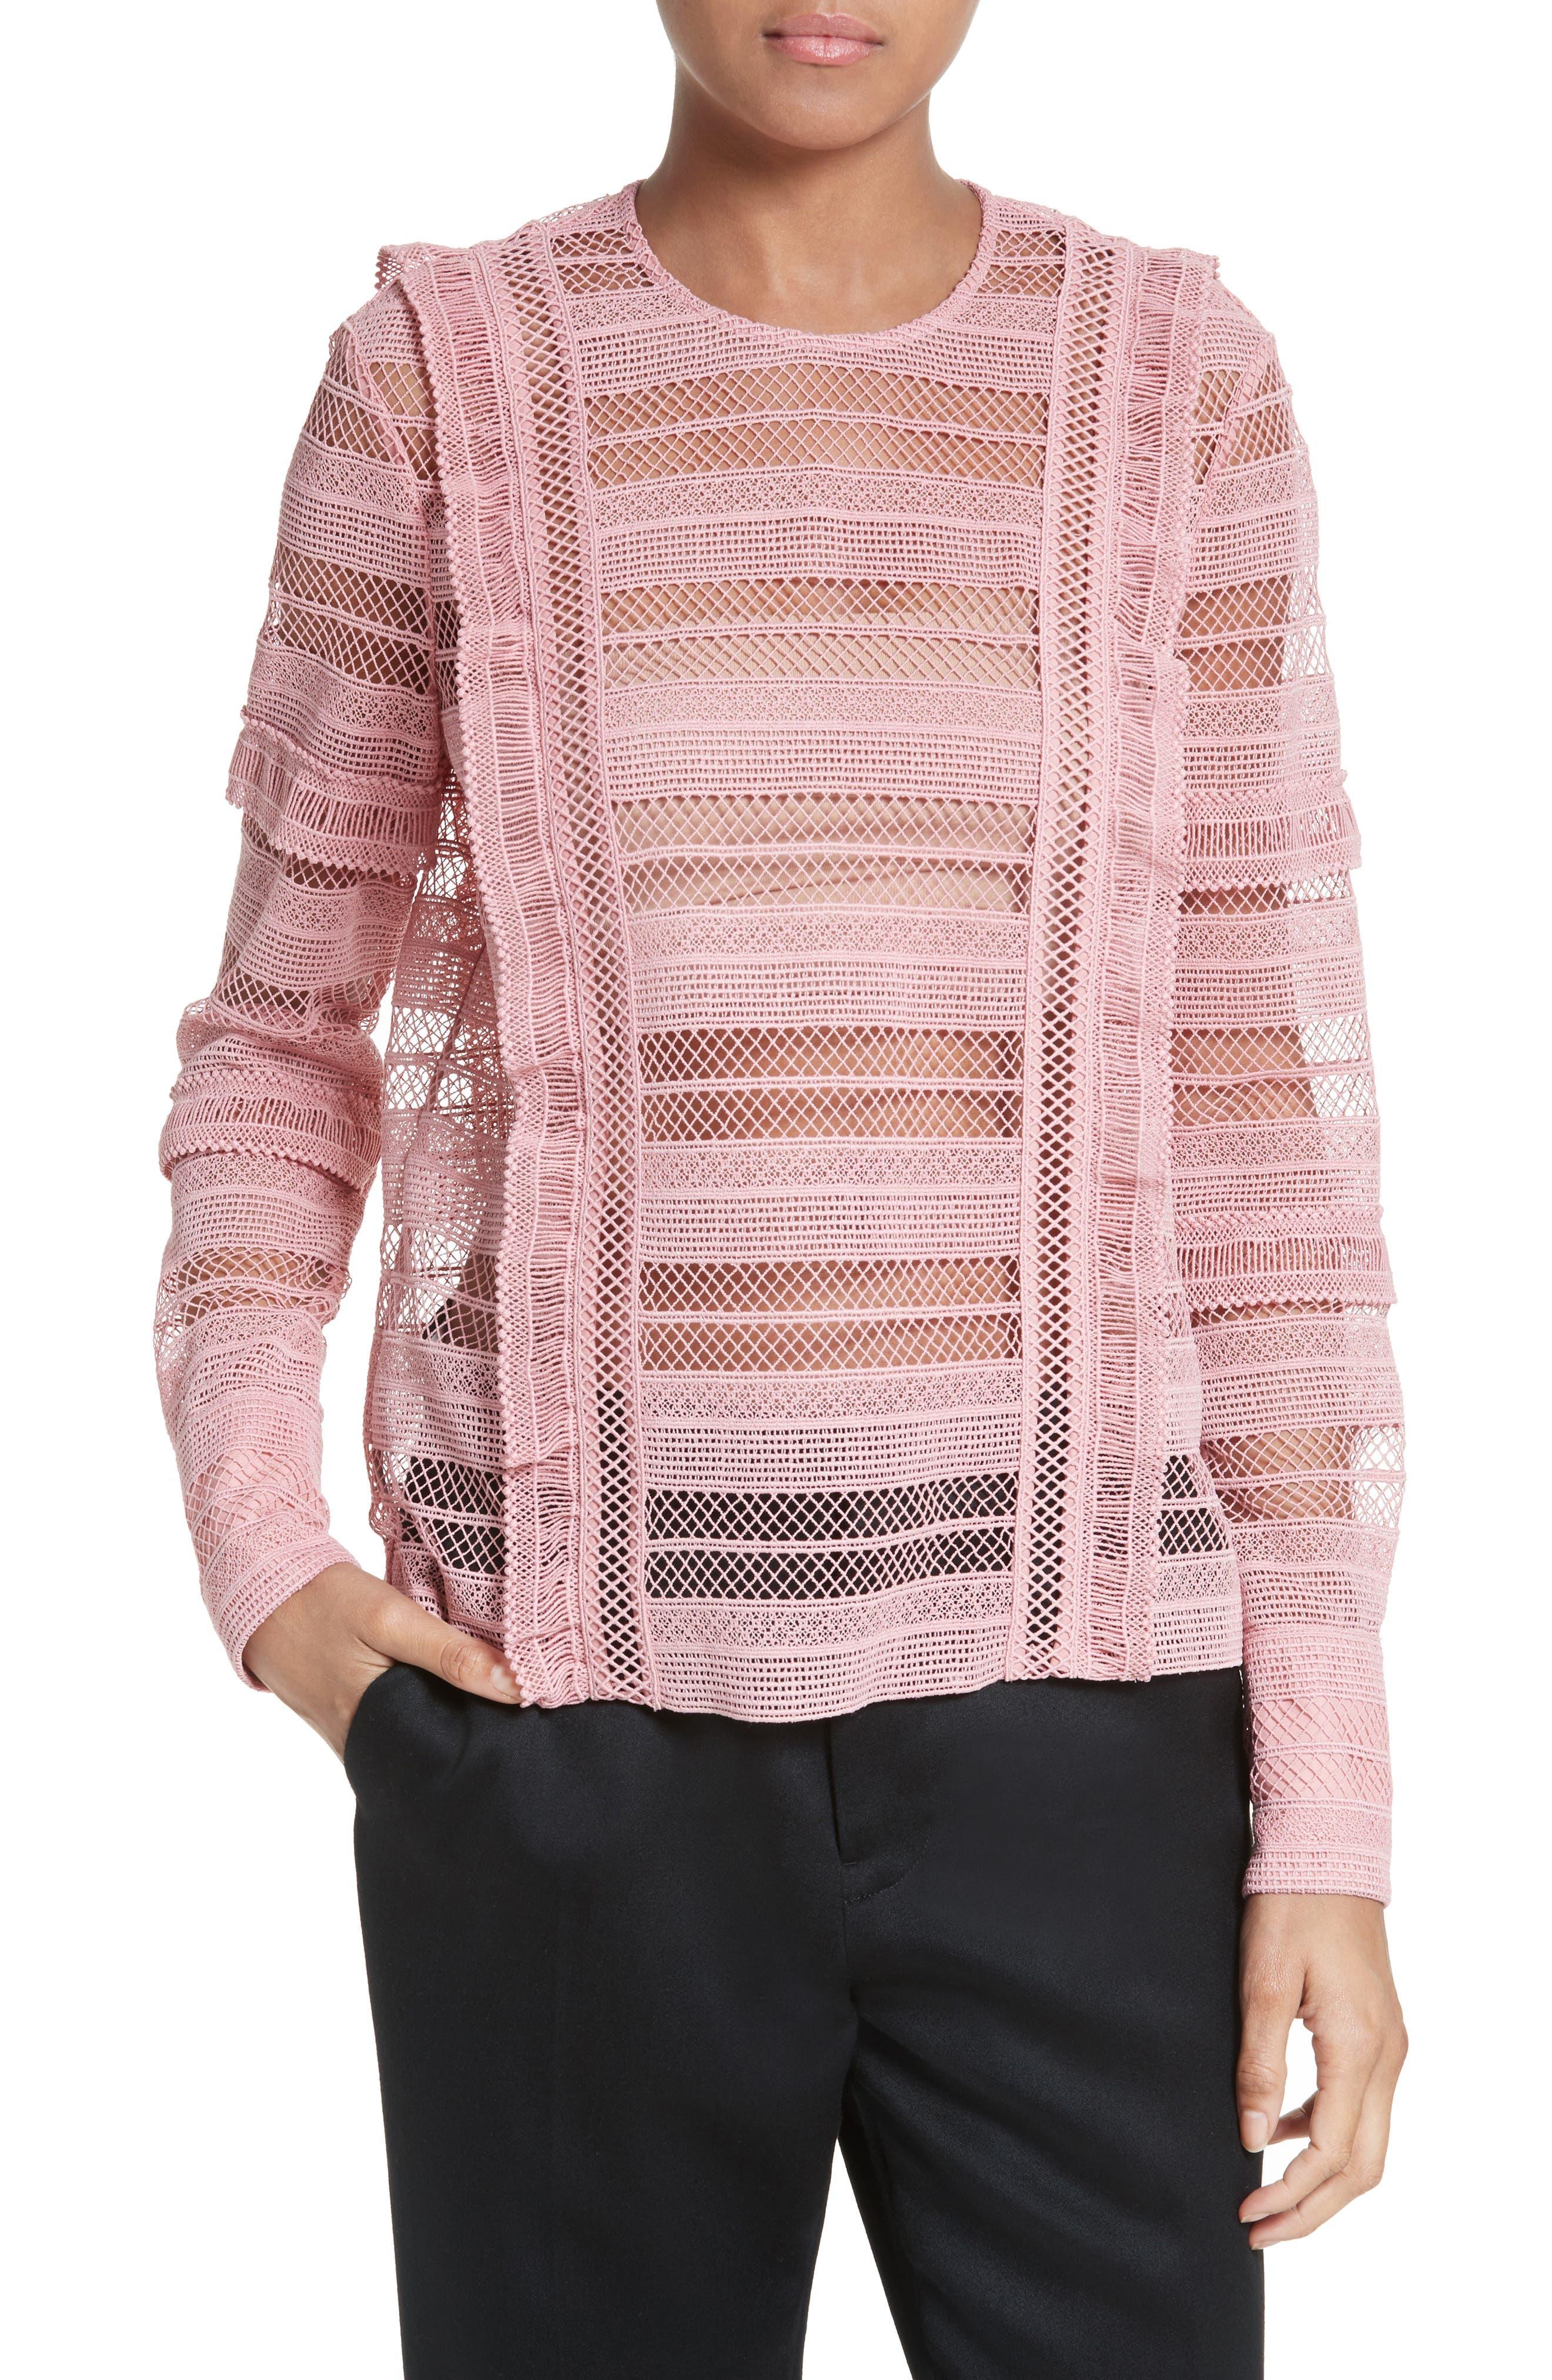 SELF-PORTRAIT Stripe Lace Top